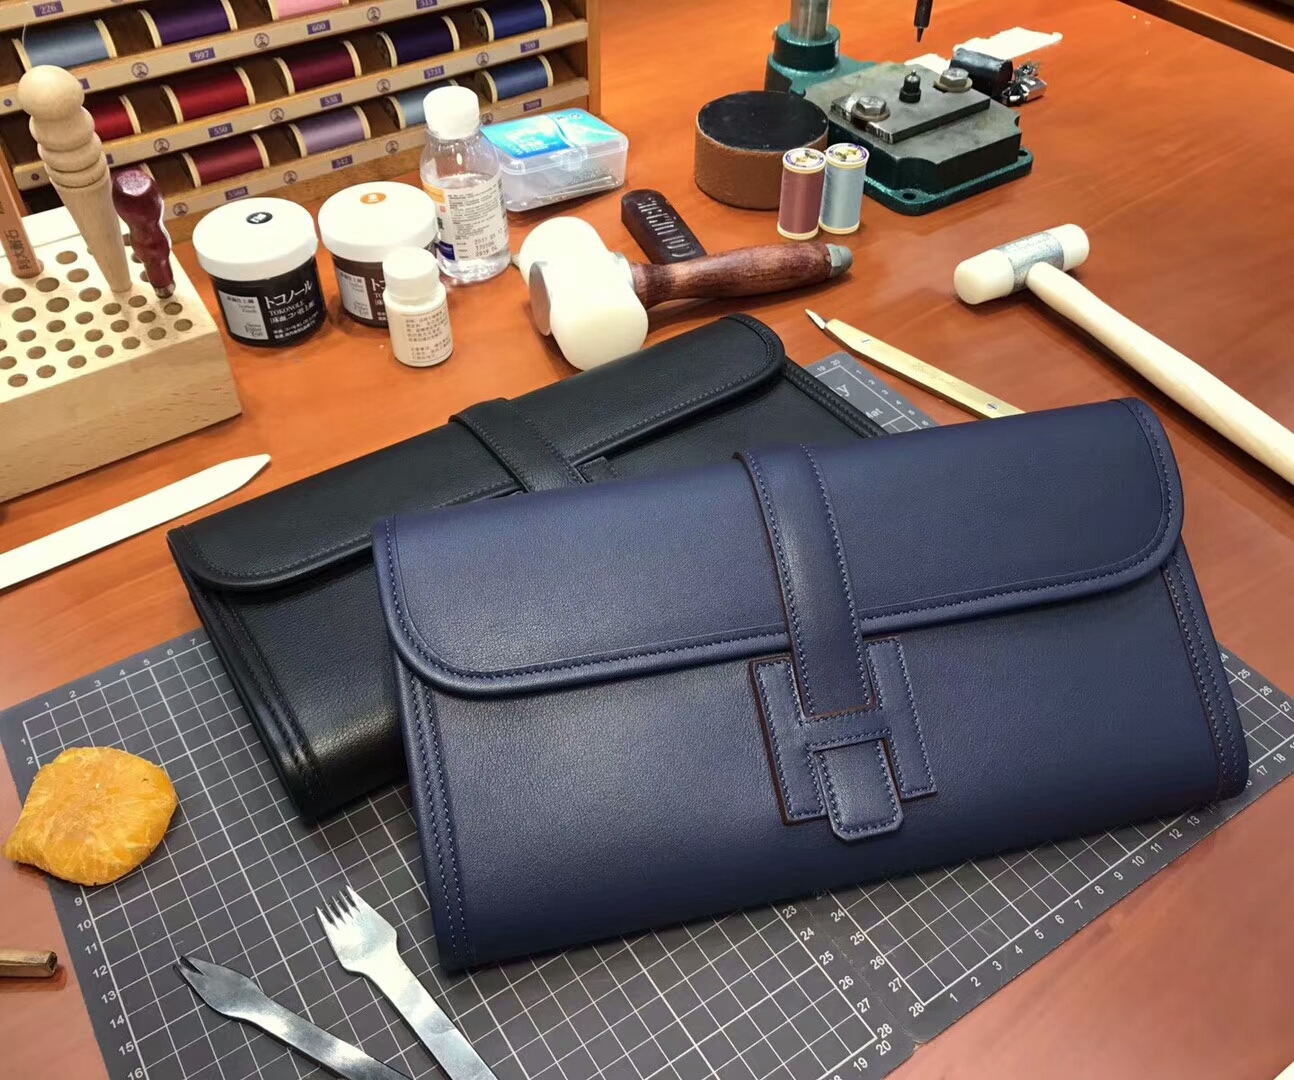 CC73 宝石蓝 Blue Saphir HERMES 爱马仕 手包 配全套专柜原版包装